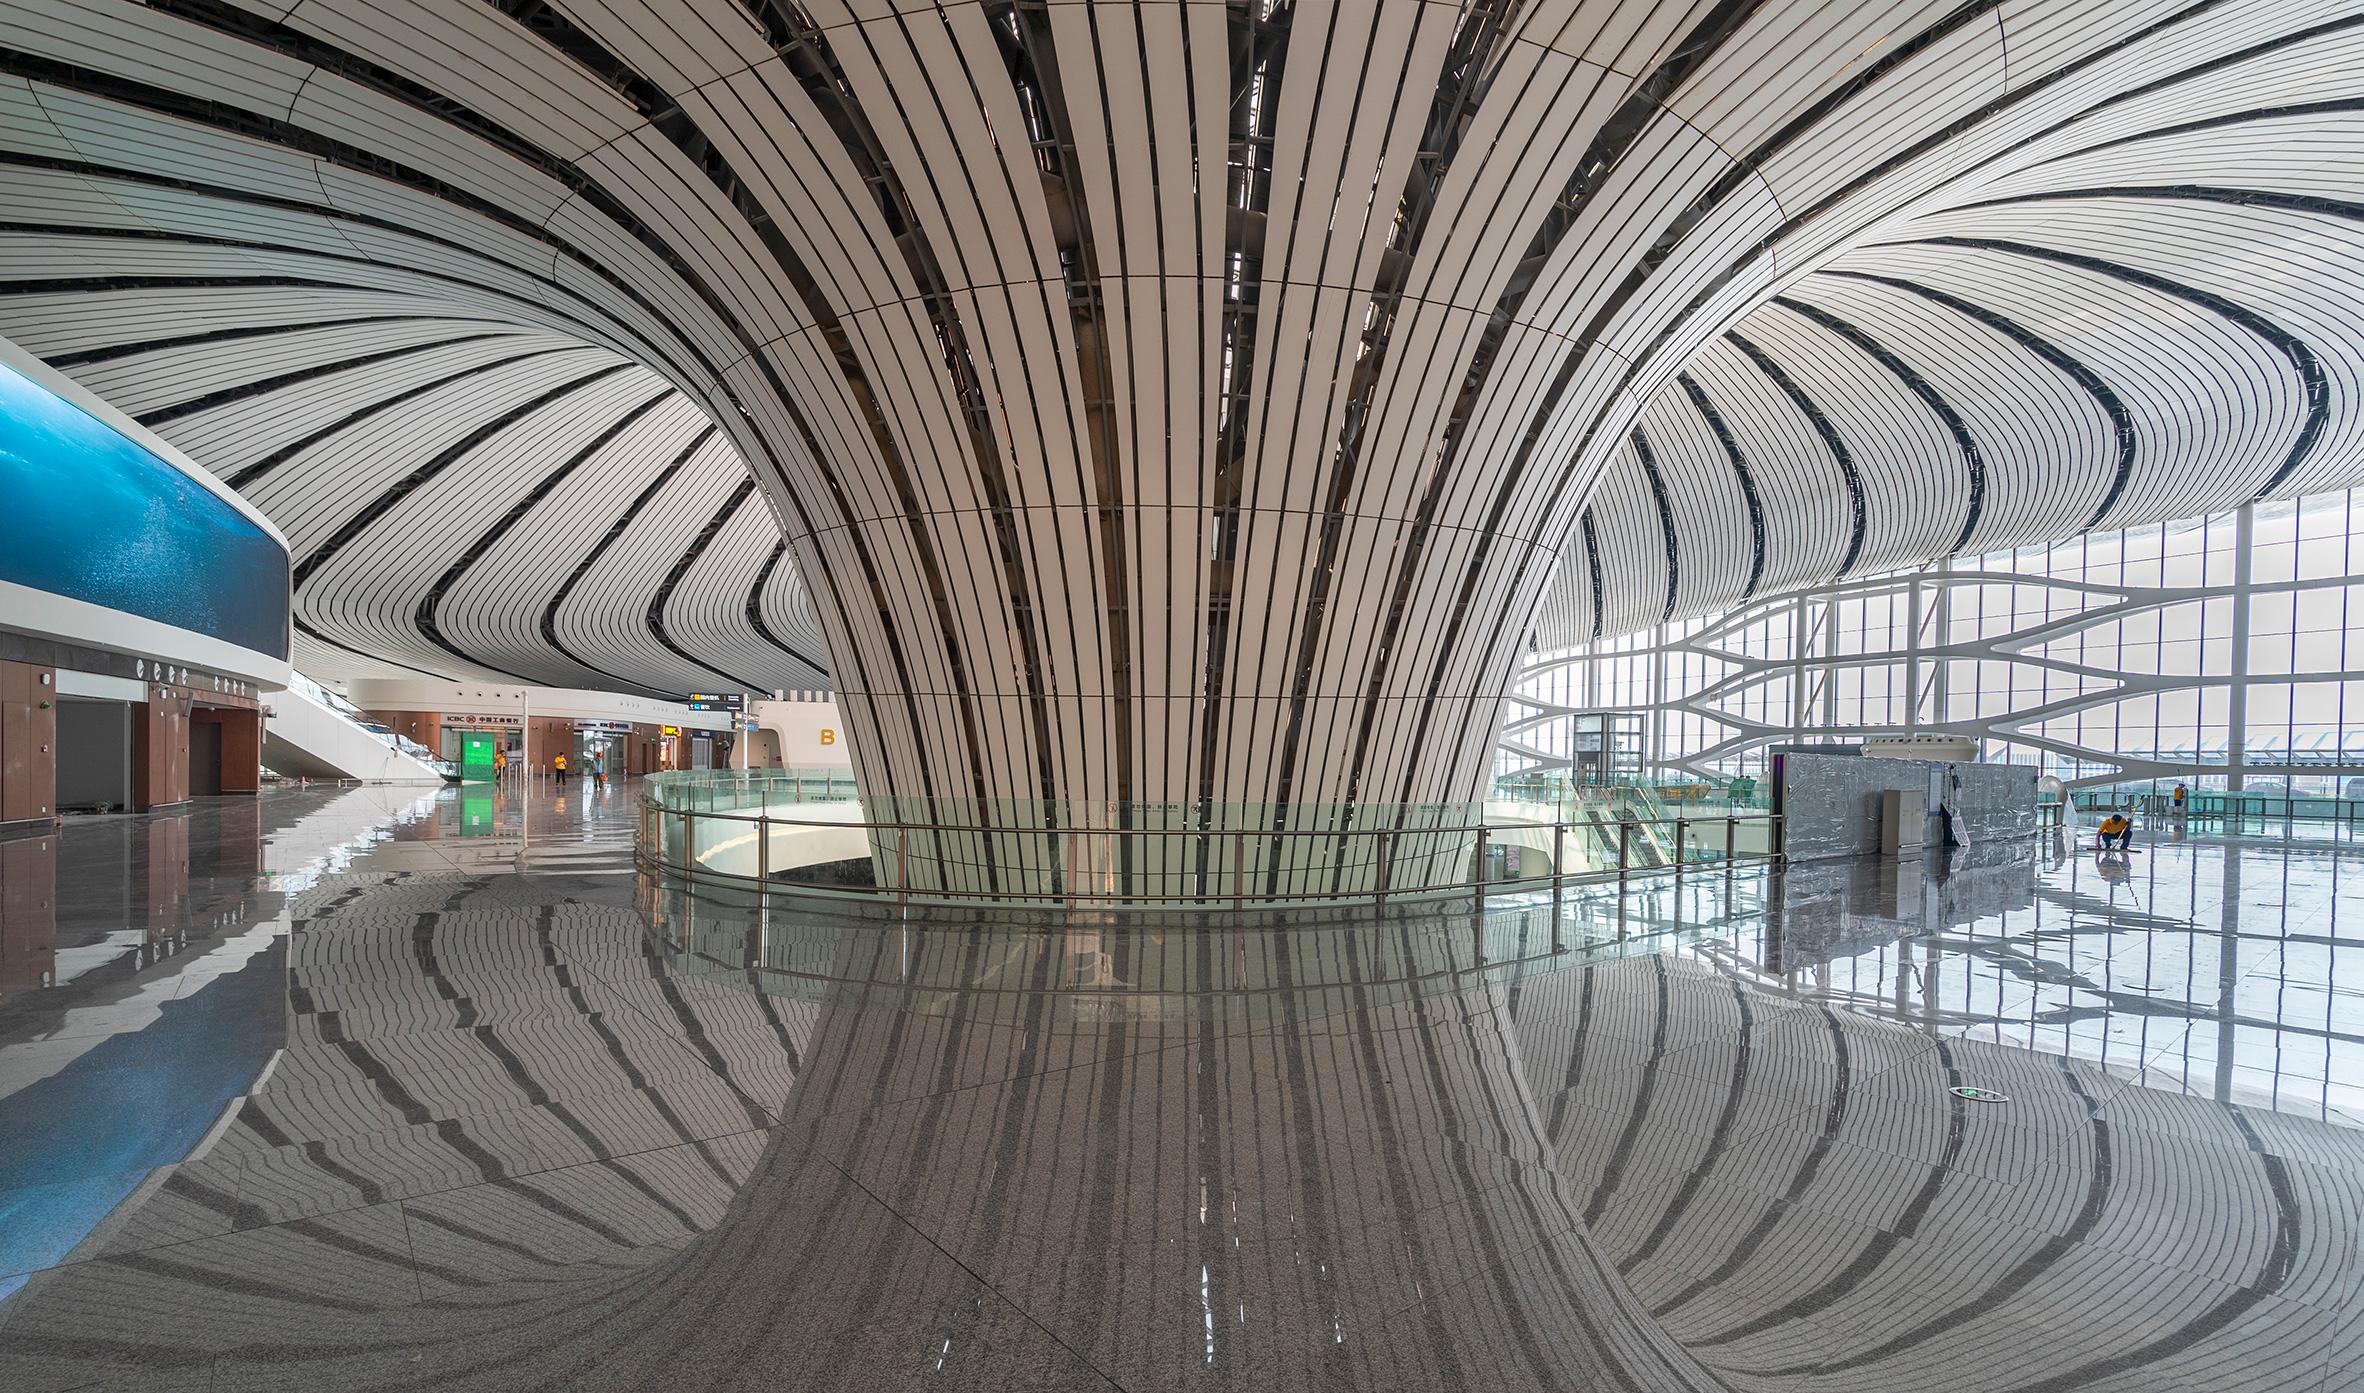 Zaha Hadid Architects' Beijing Airport Project Unveiled zaha hadid architects Zaha Hadid Architects' Beijing Airport Project Unveiled Beijing Daxing International Airport Zaha Hadid CGTN dezeen 05